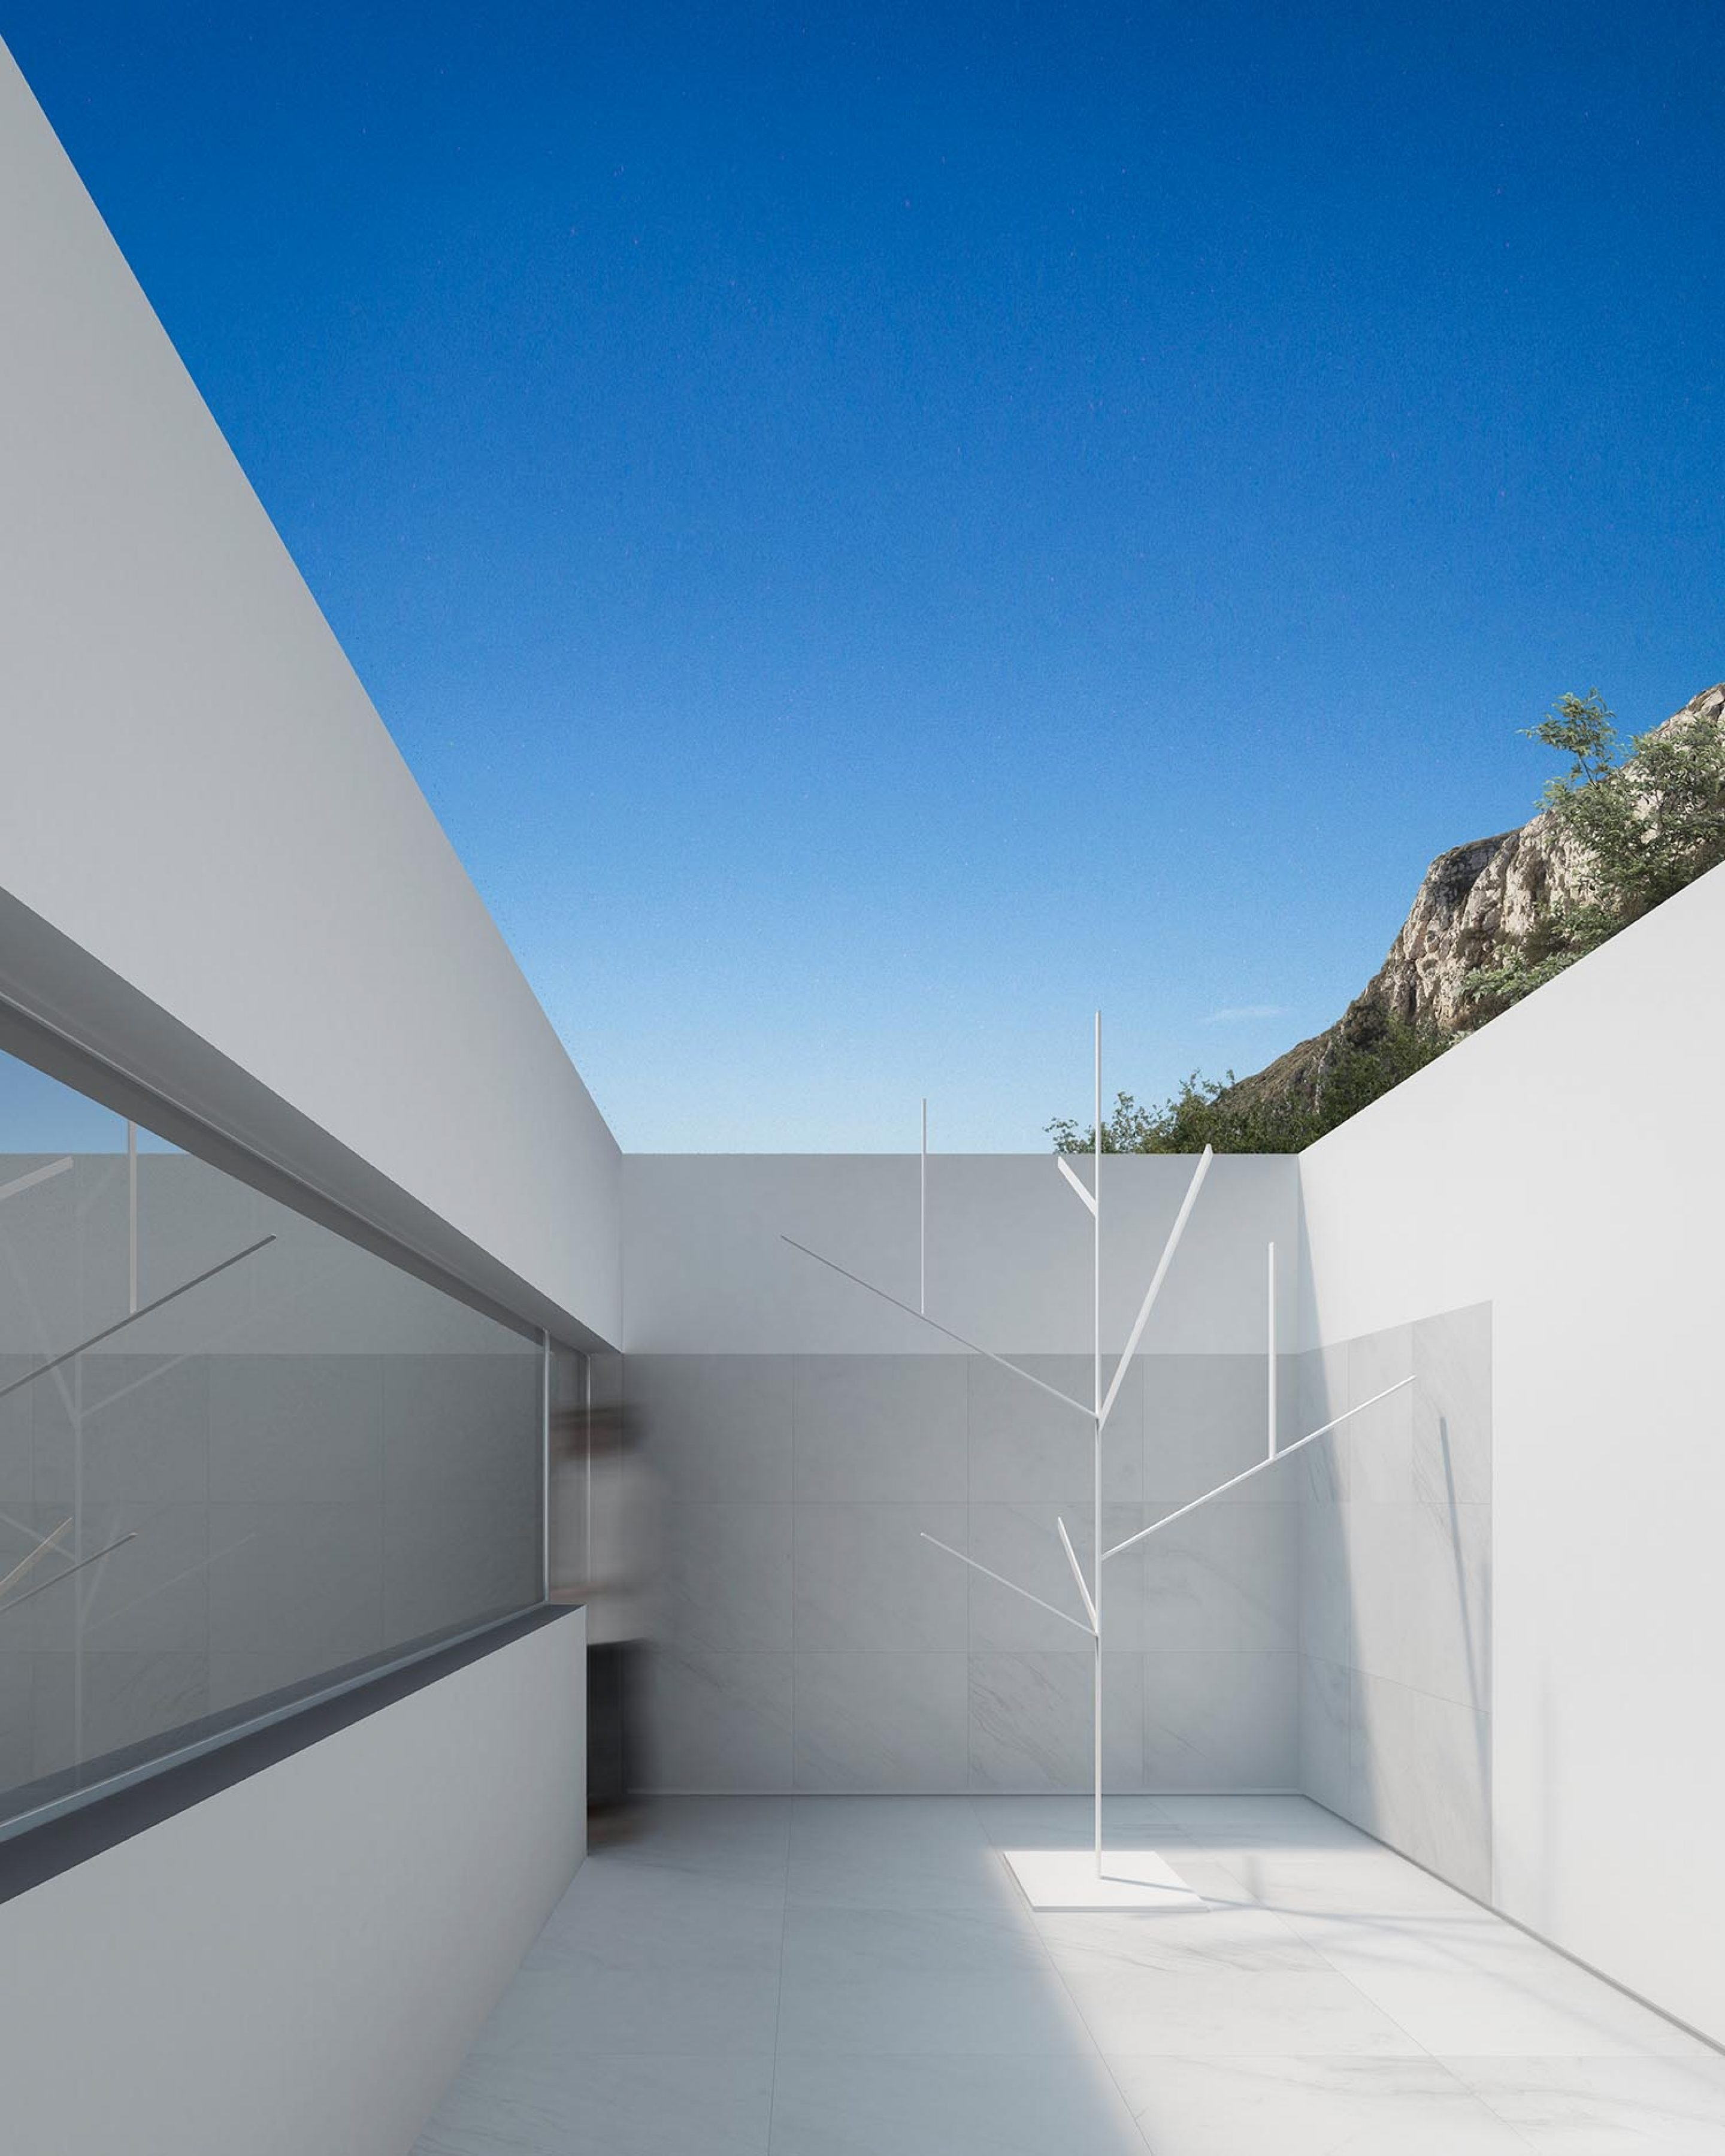 Architecture_MinimalHollywoodResidence_FranSilvestreArquitectos04